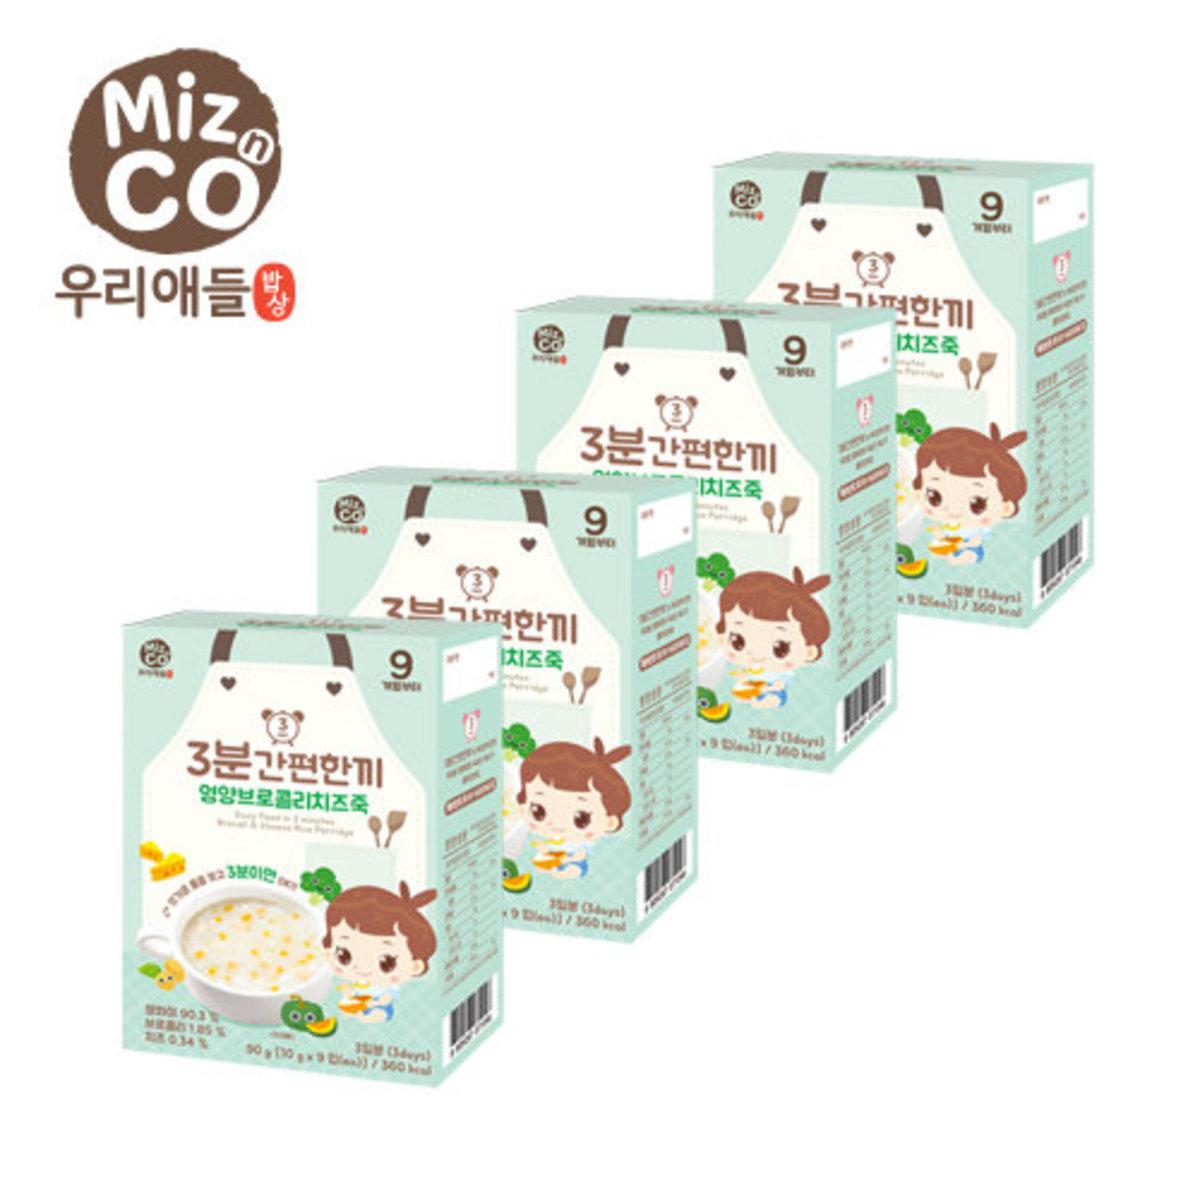 Rice Porridge - Broccoli & Cheese  (+9 Months) - 4 Packs